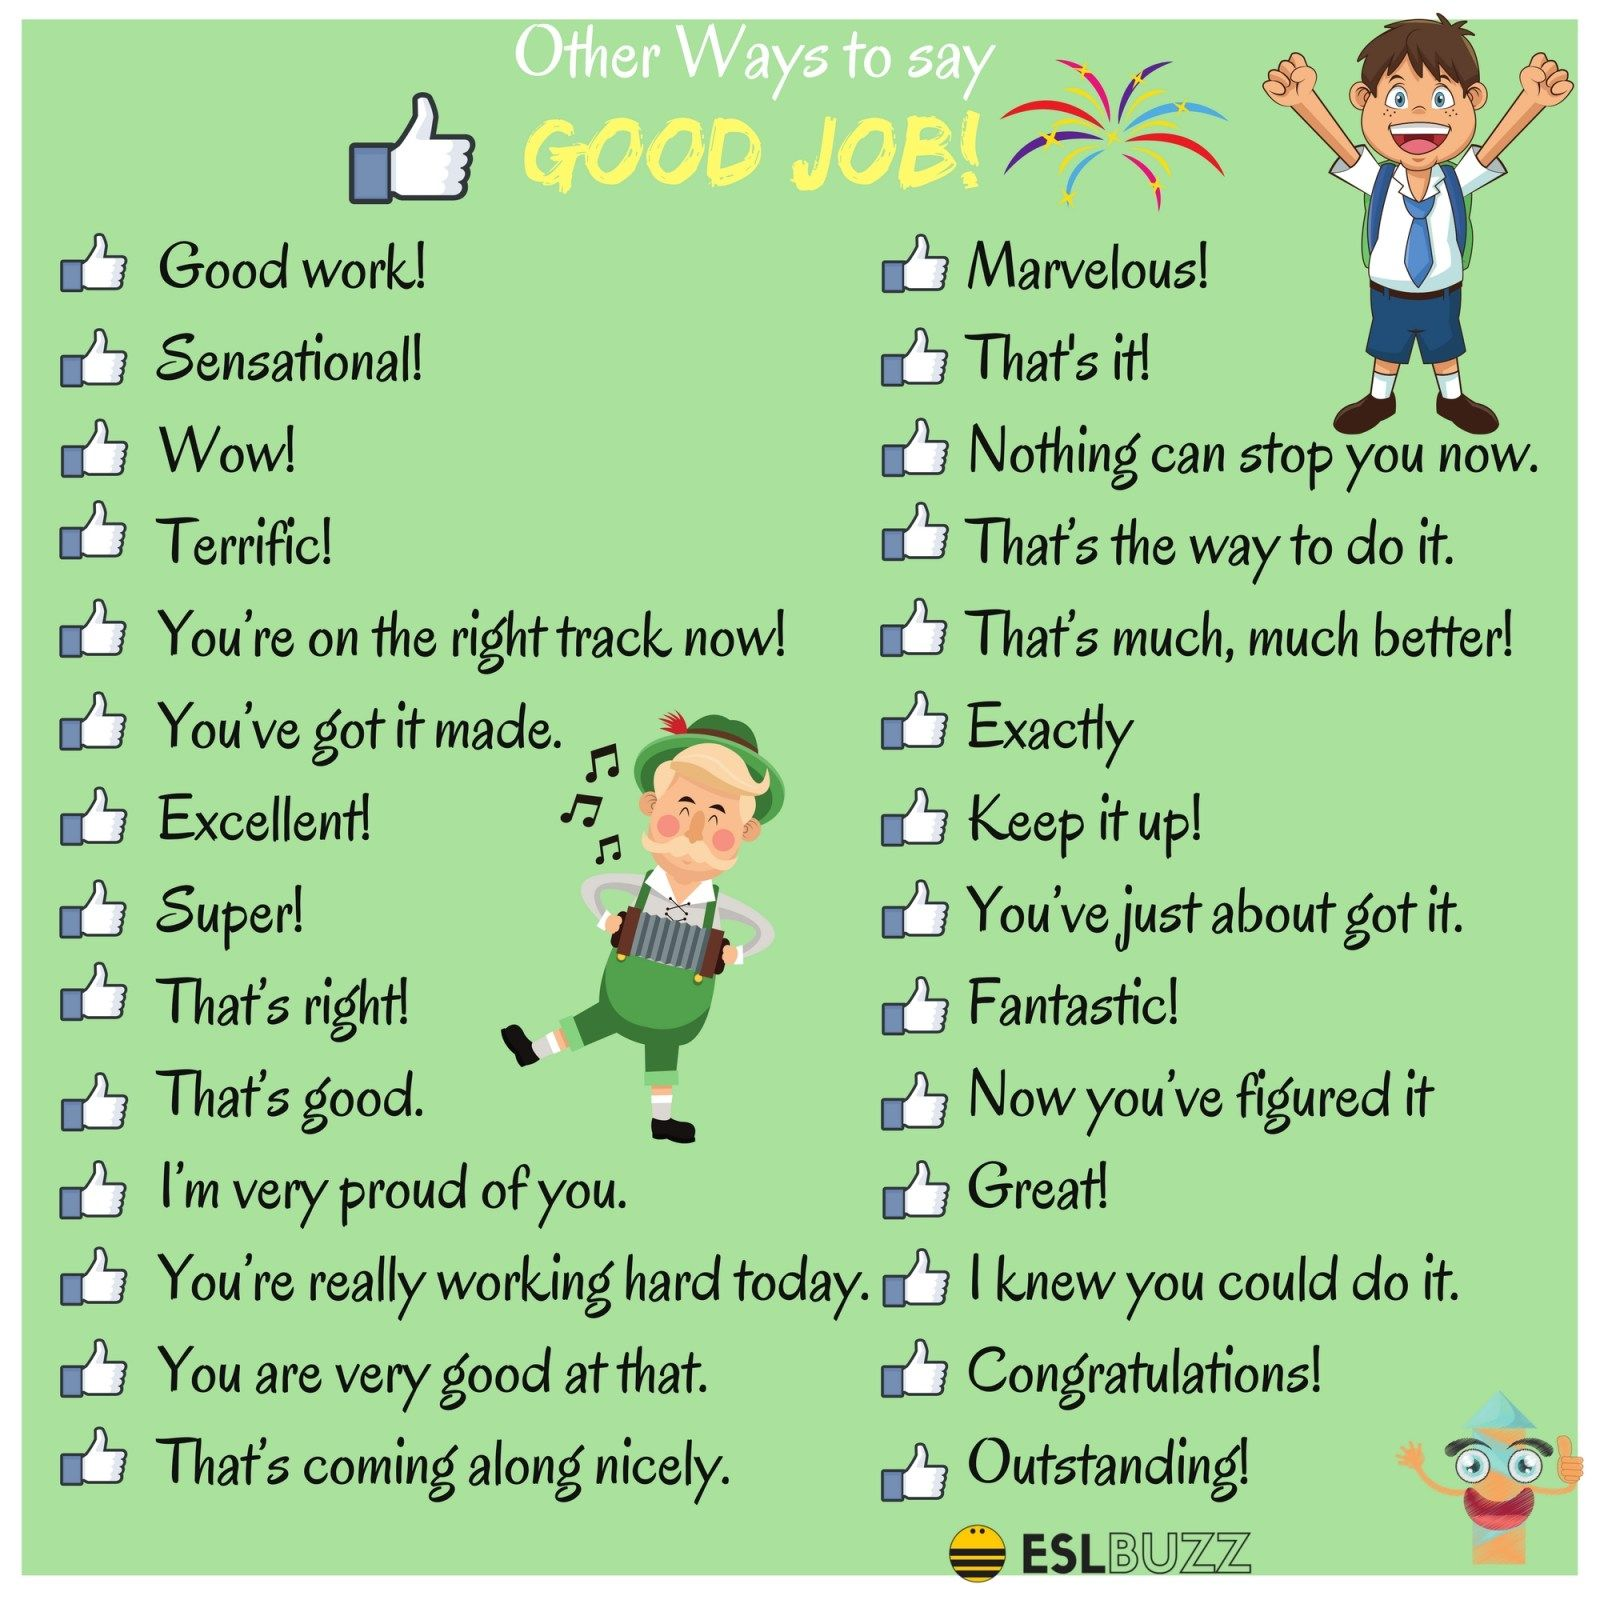 100 Powerful Ways To Say Good Job In English